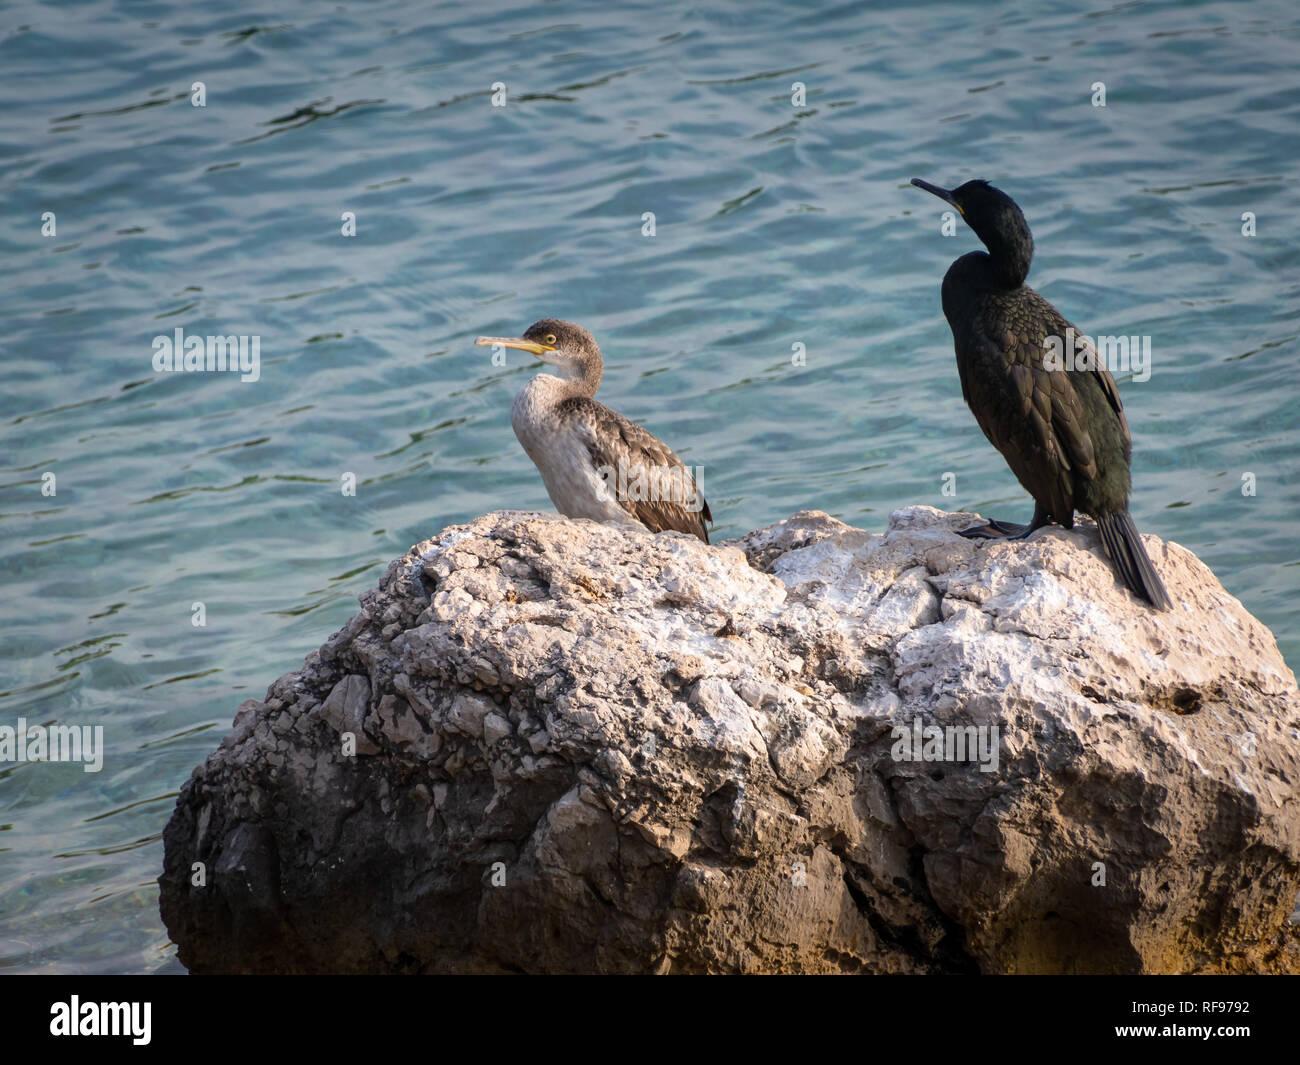 An immature and an adult common shag (Phalacrocorax aristotelis) sitting on a rock near the sea, Croatia - Stock Image